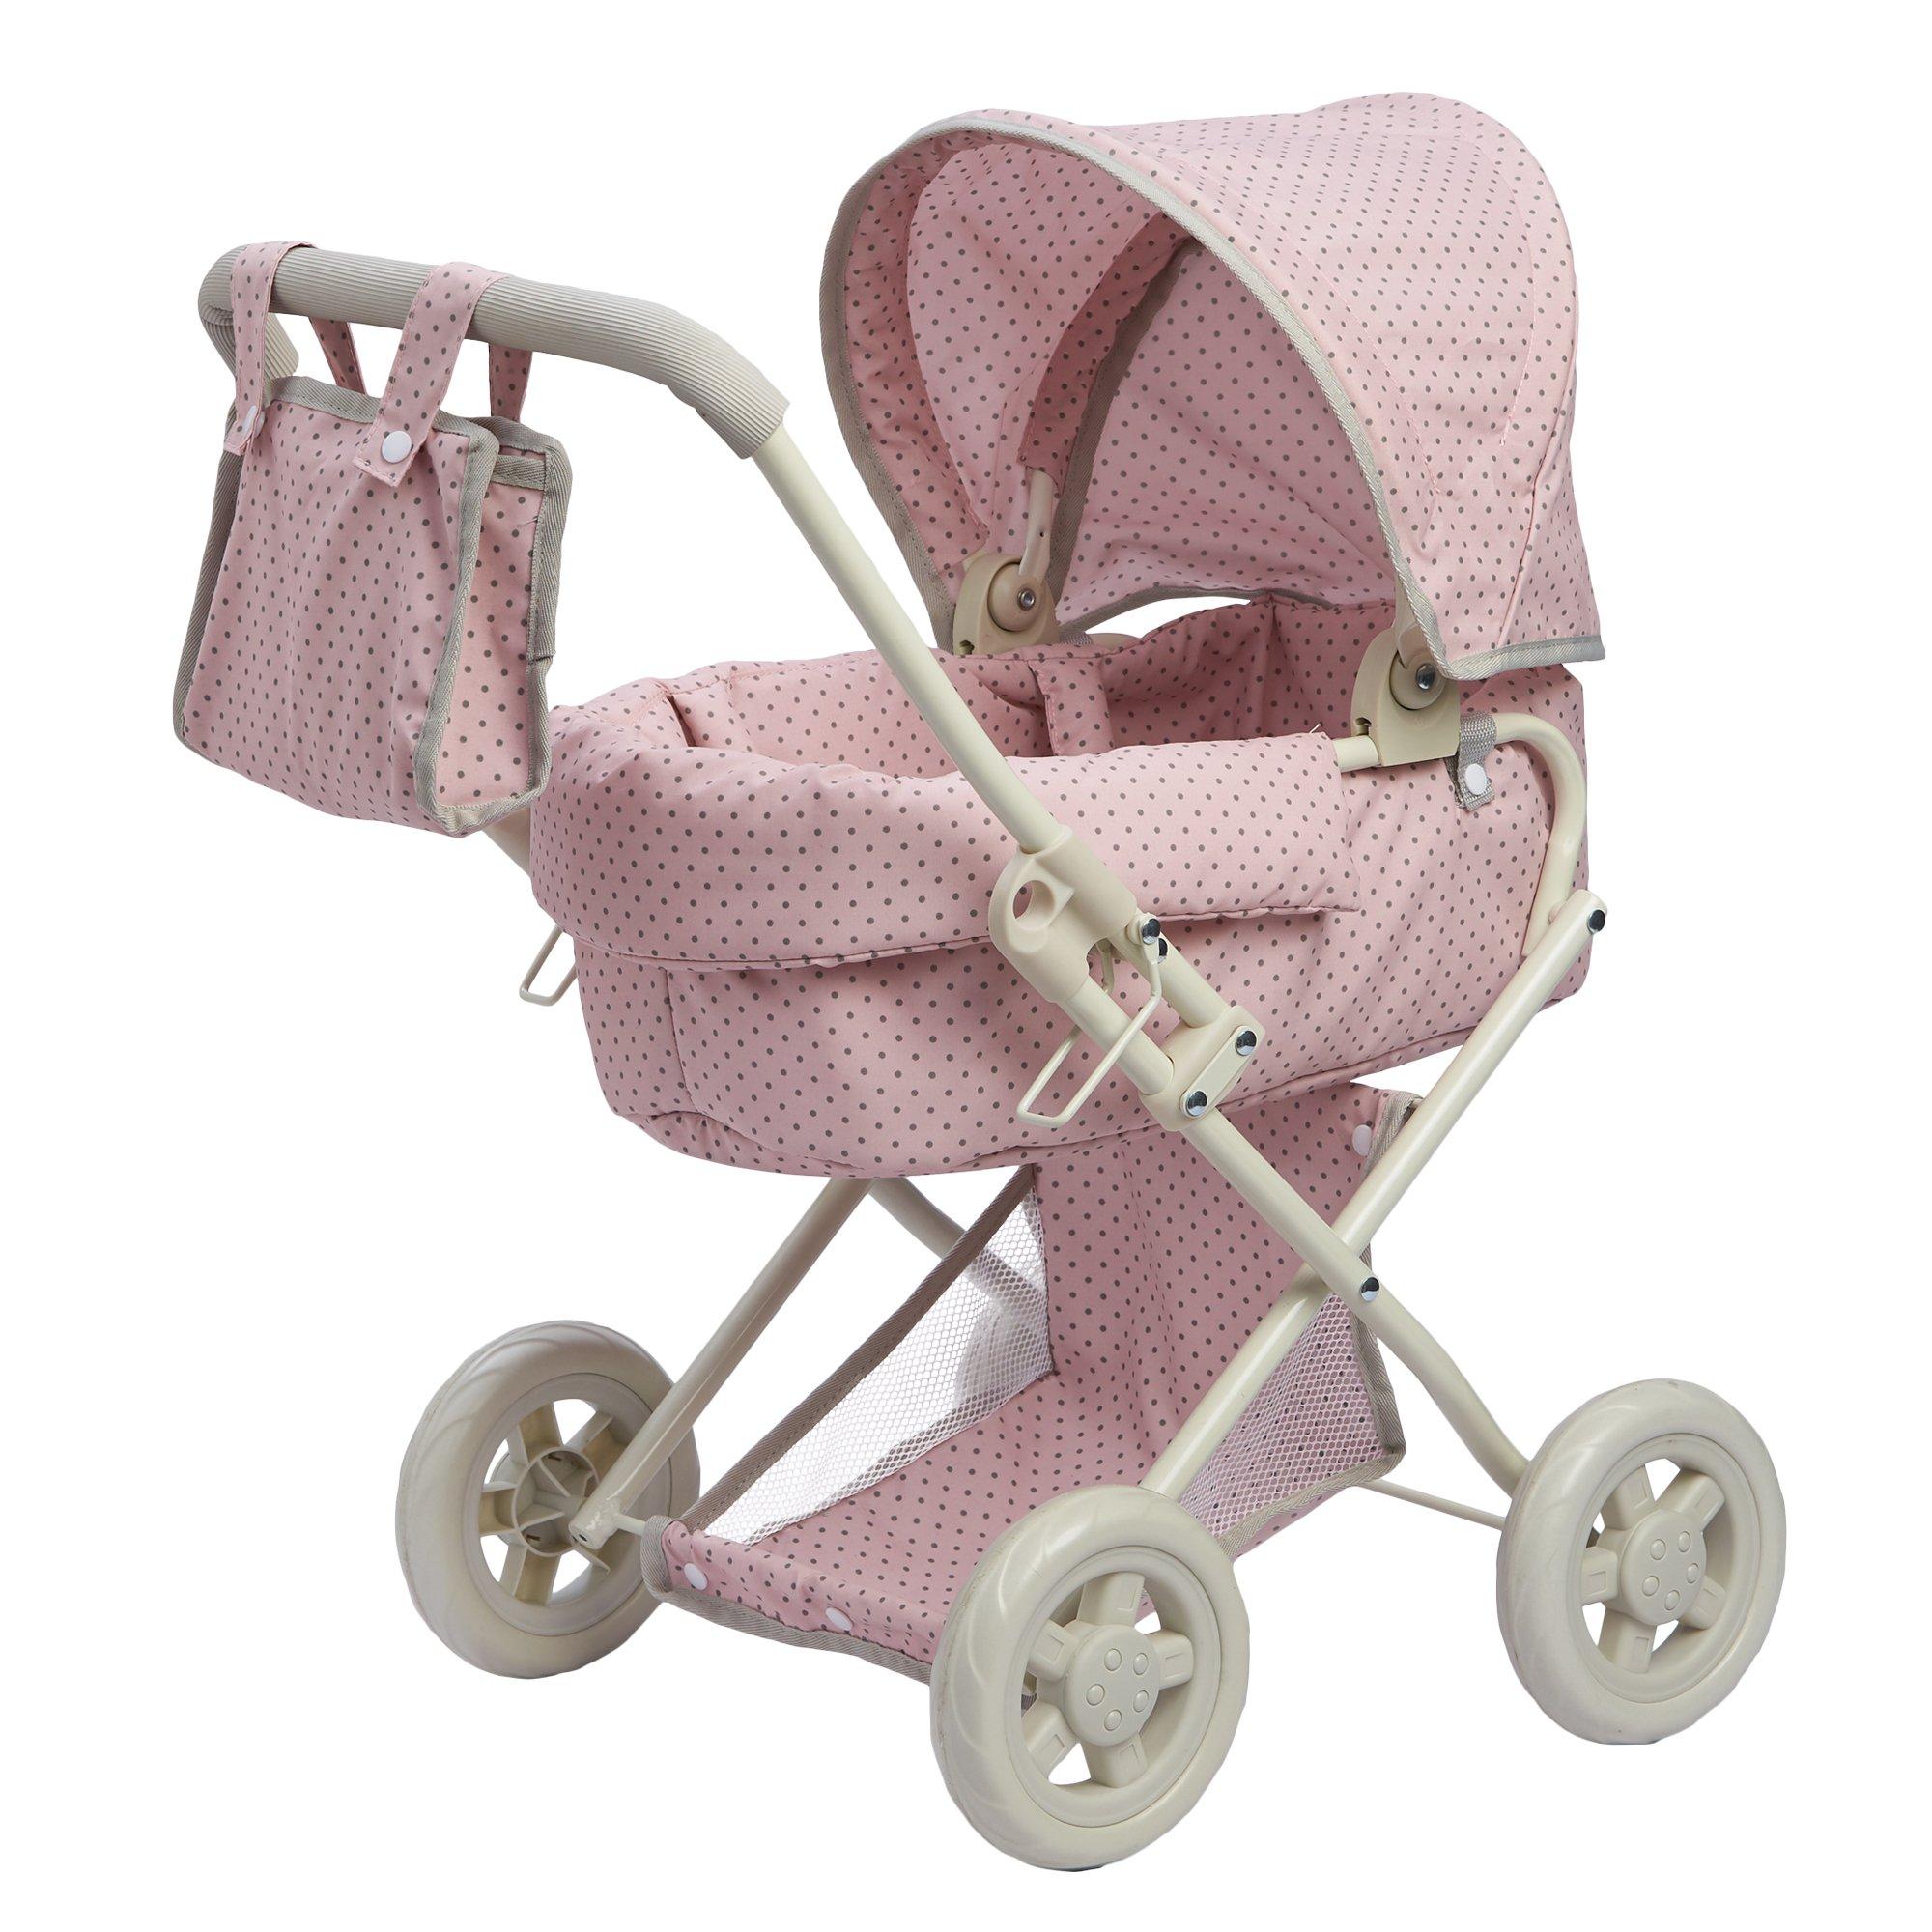 Olivia's Little World 16'' Baby Doll Furniture Stroller, Pink/Grey, 22'' x 14.37'' x 25.2''